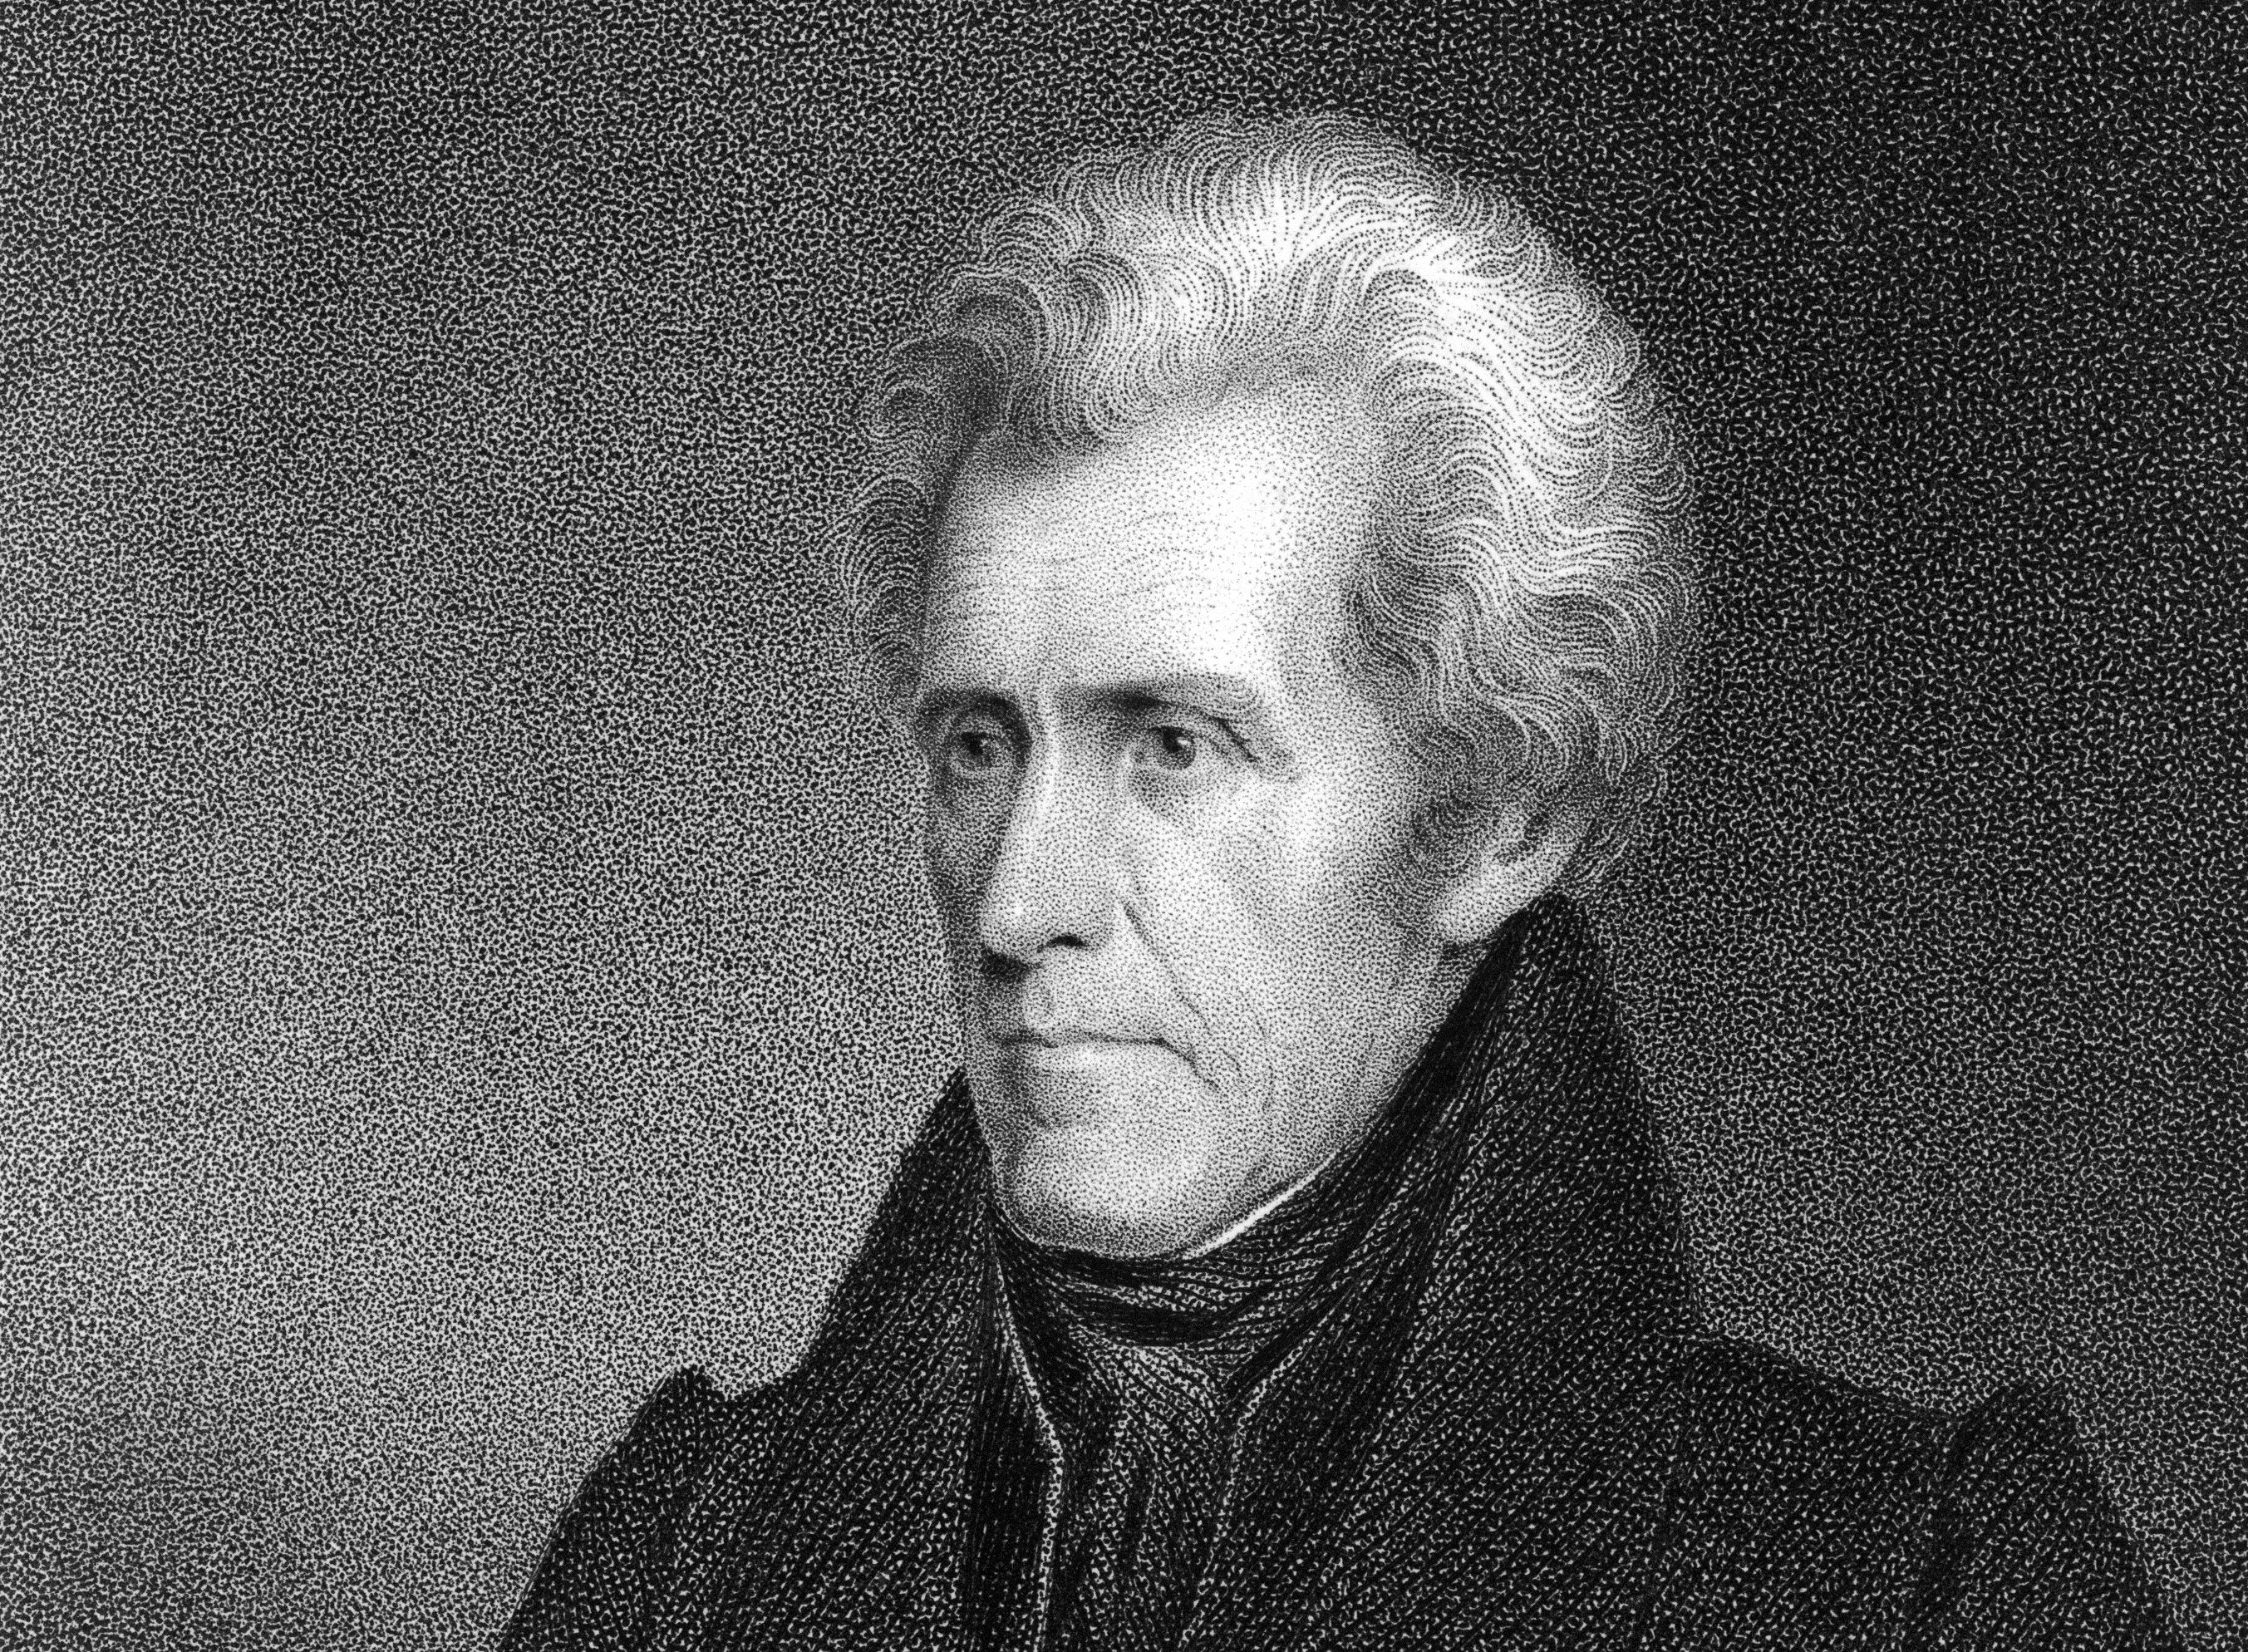 Engraved portrait of Andrew Jackson